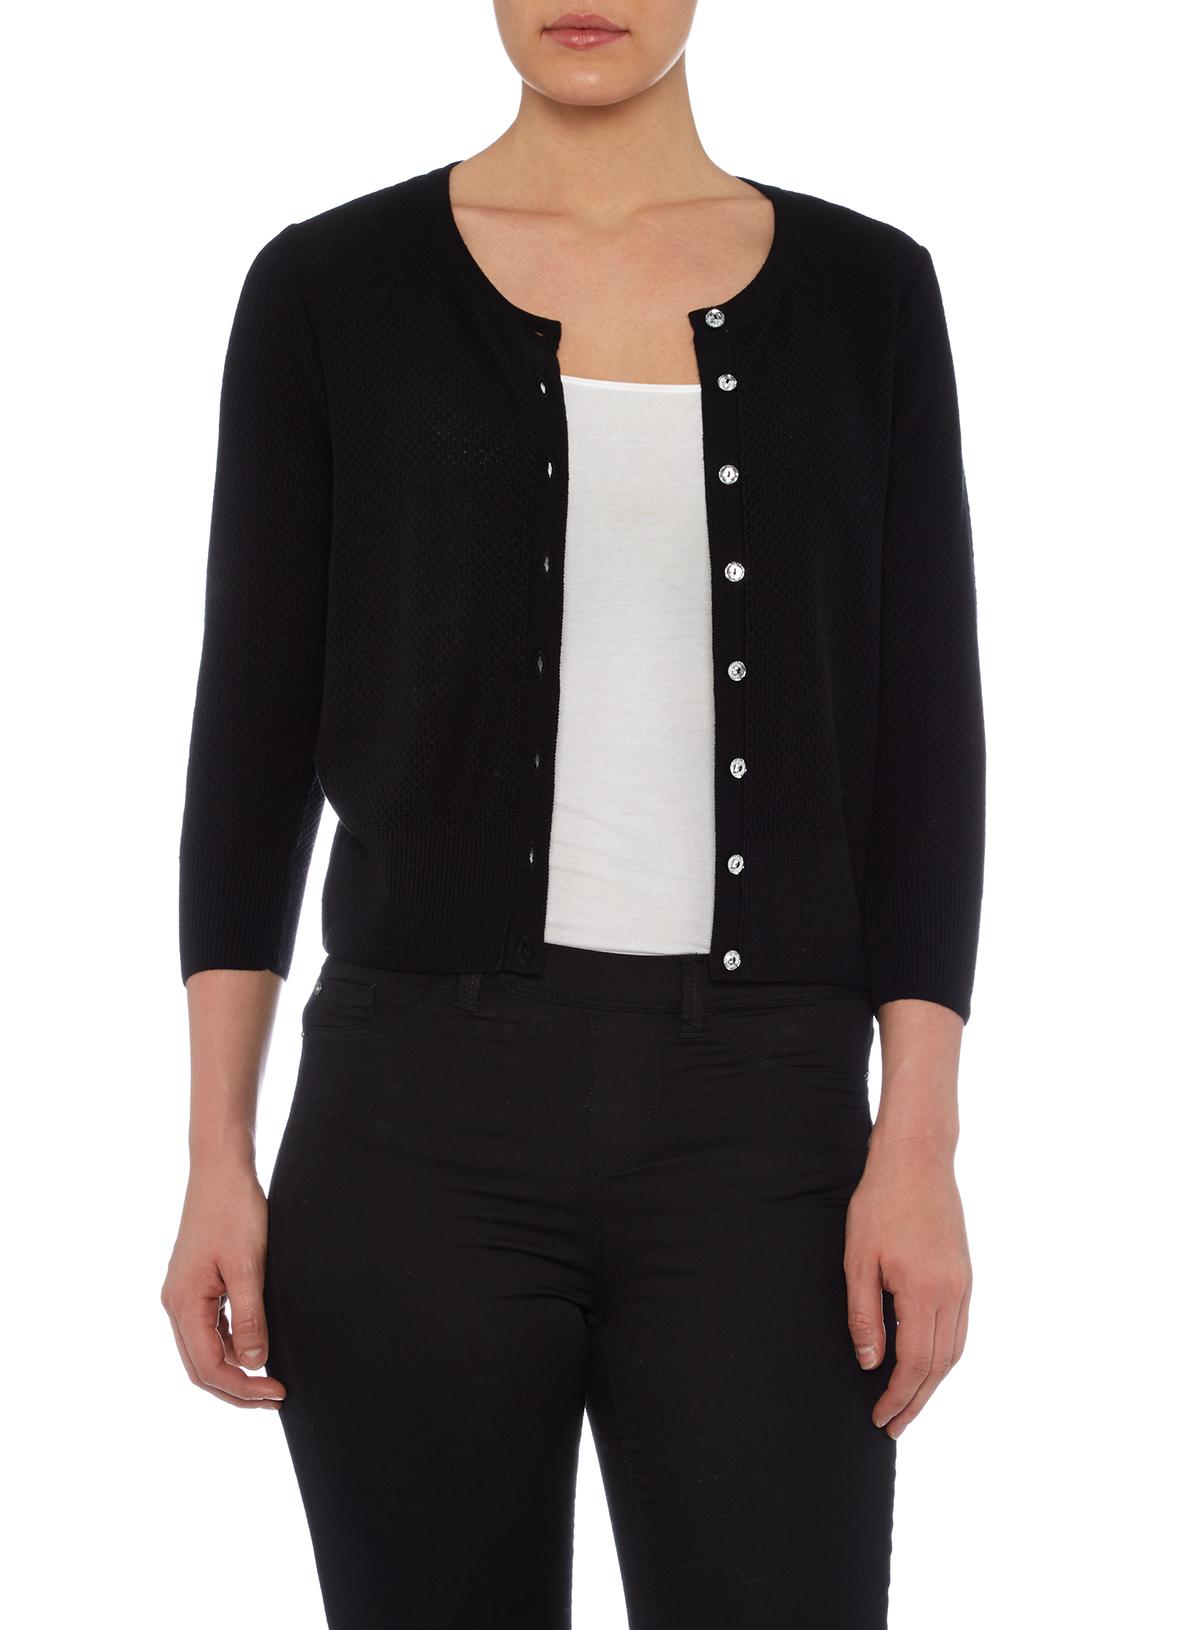 Womens Black Textured Cropped Cardigan | Tu clothing